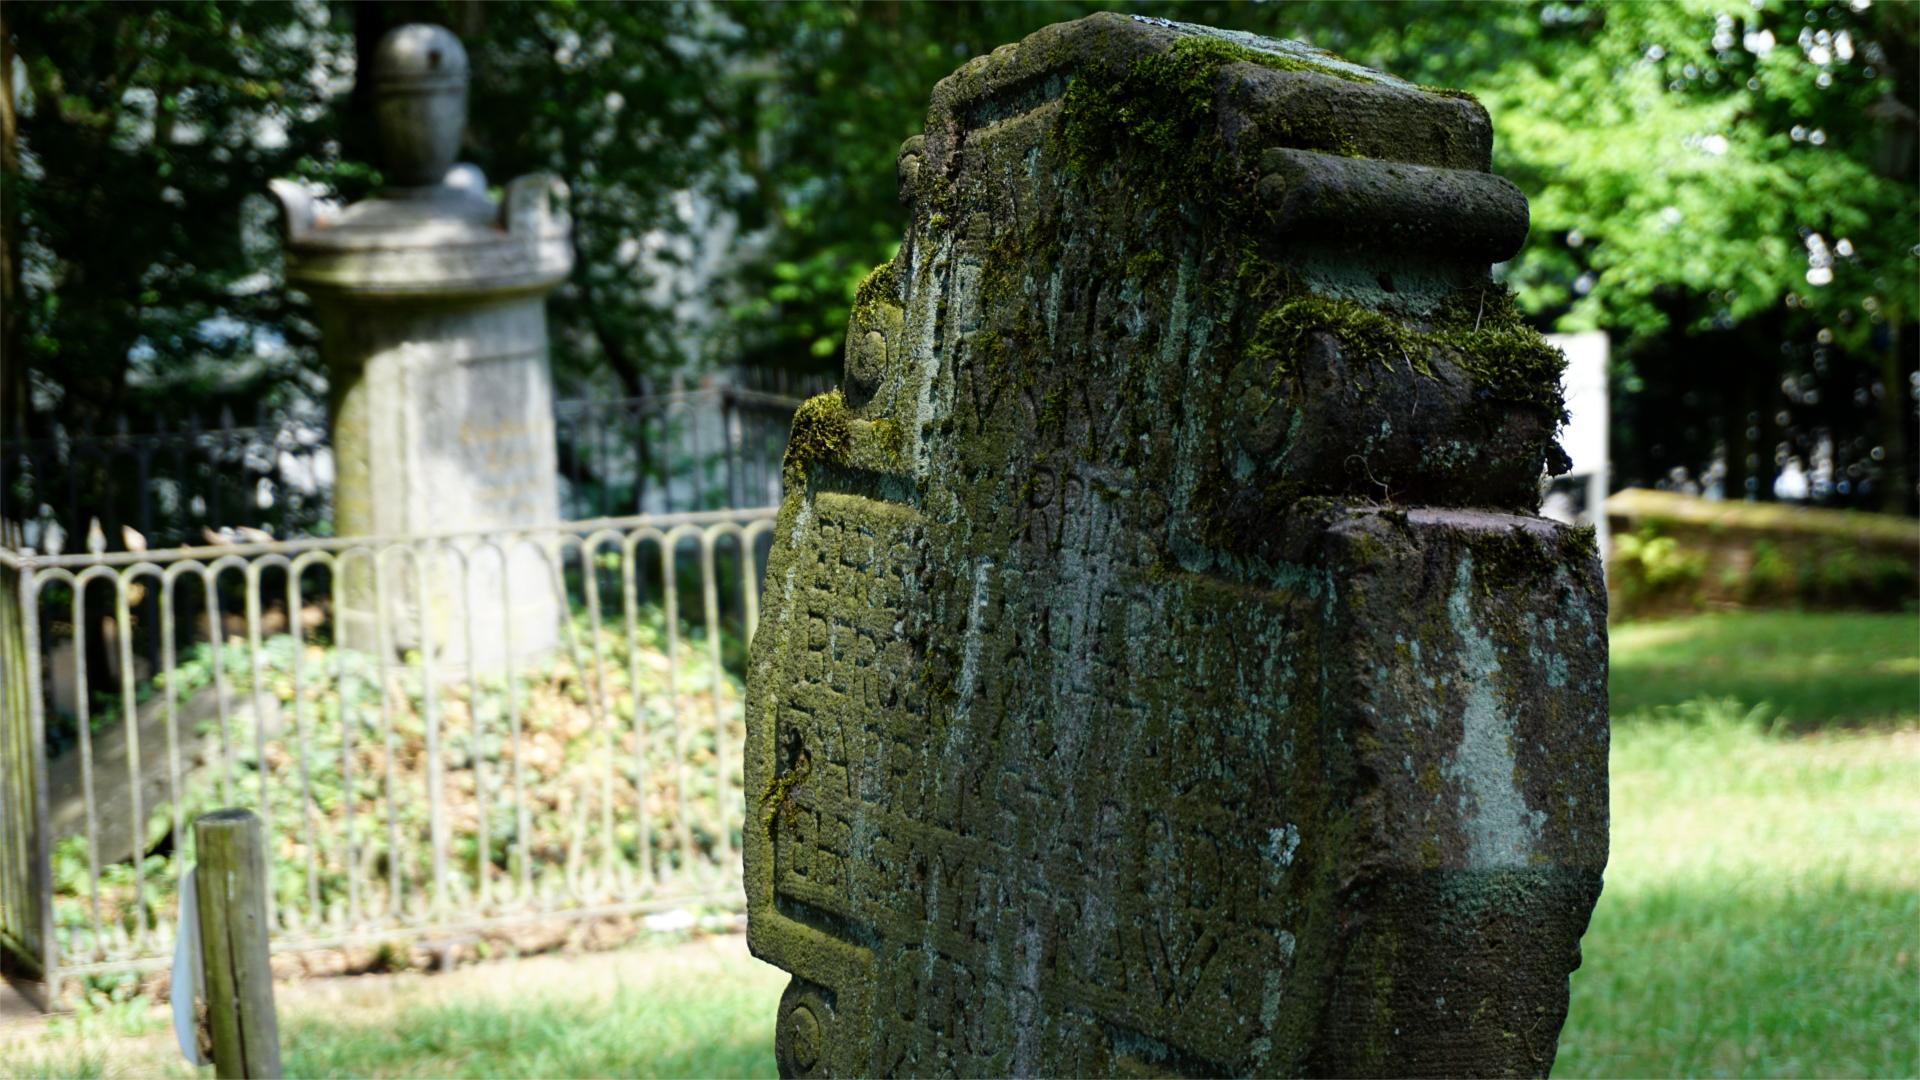 Kreuz 300 Jahre alt — Tradition